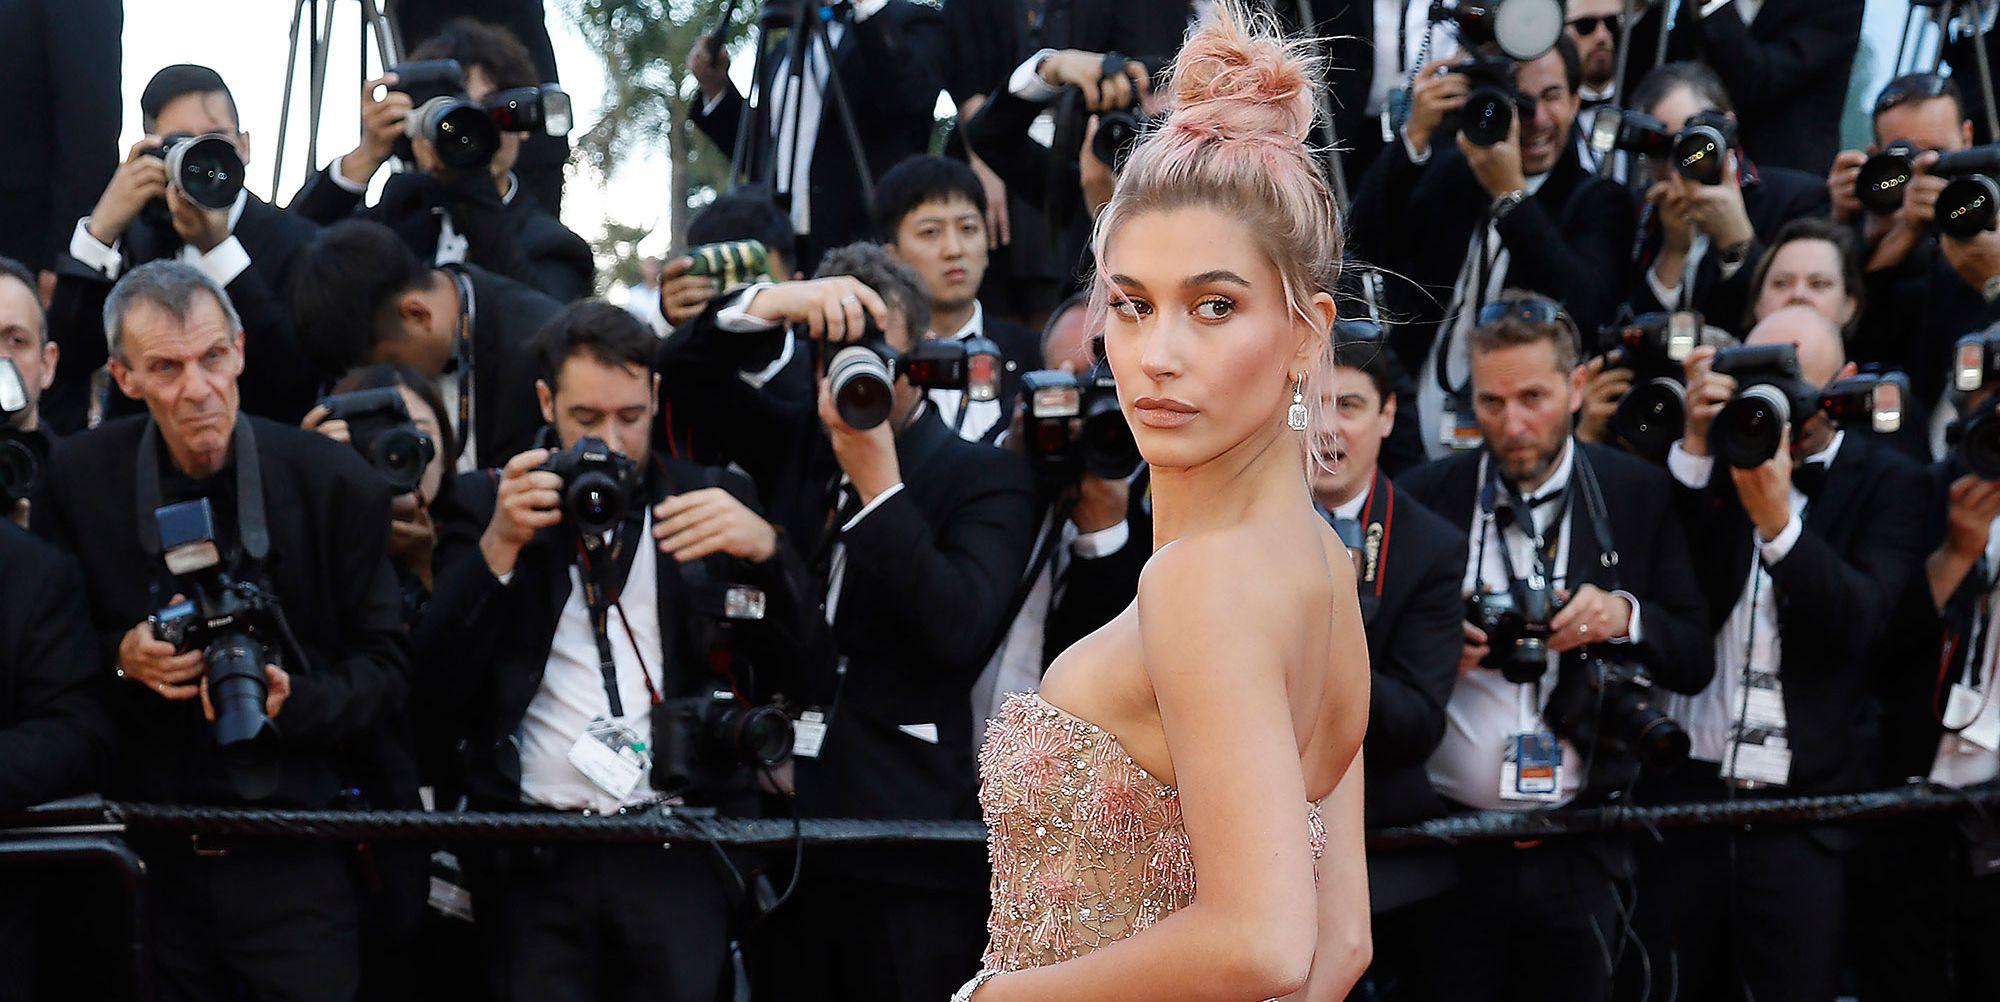 Hailey Baldwin in Cannes